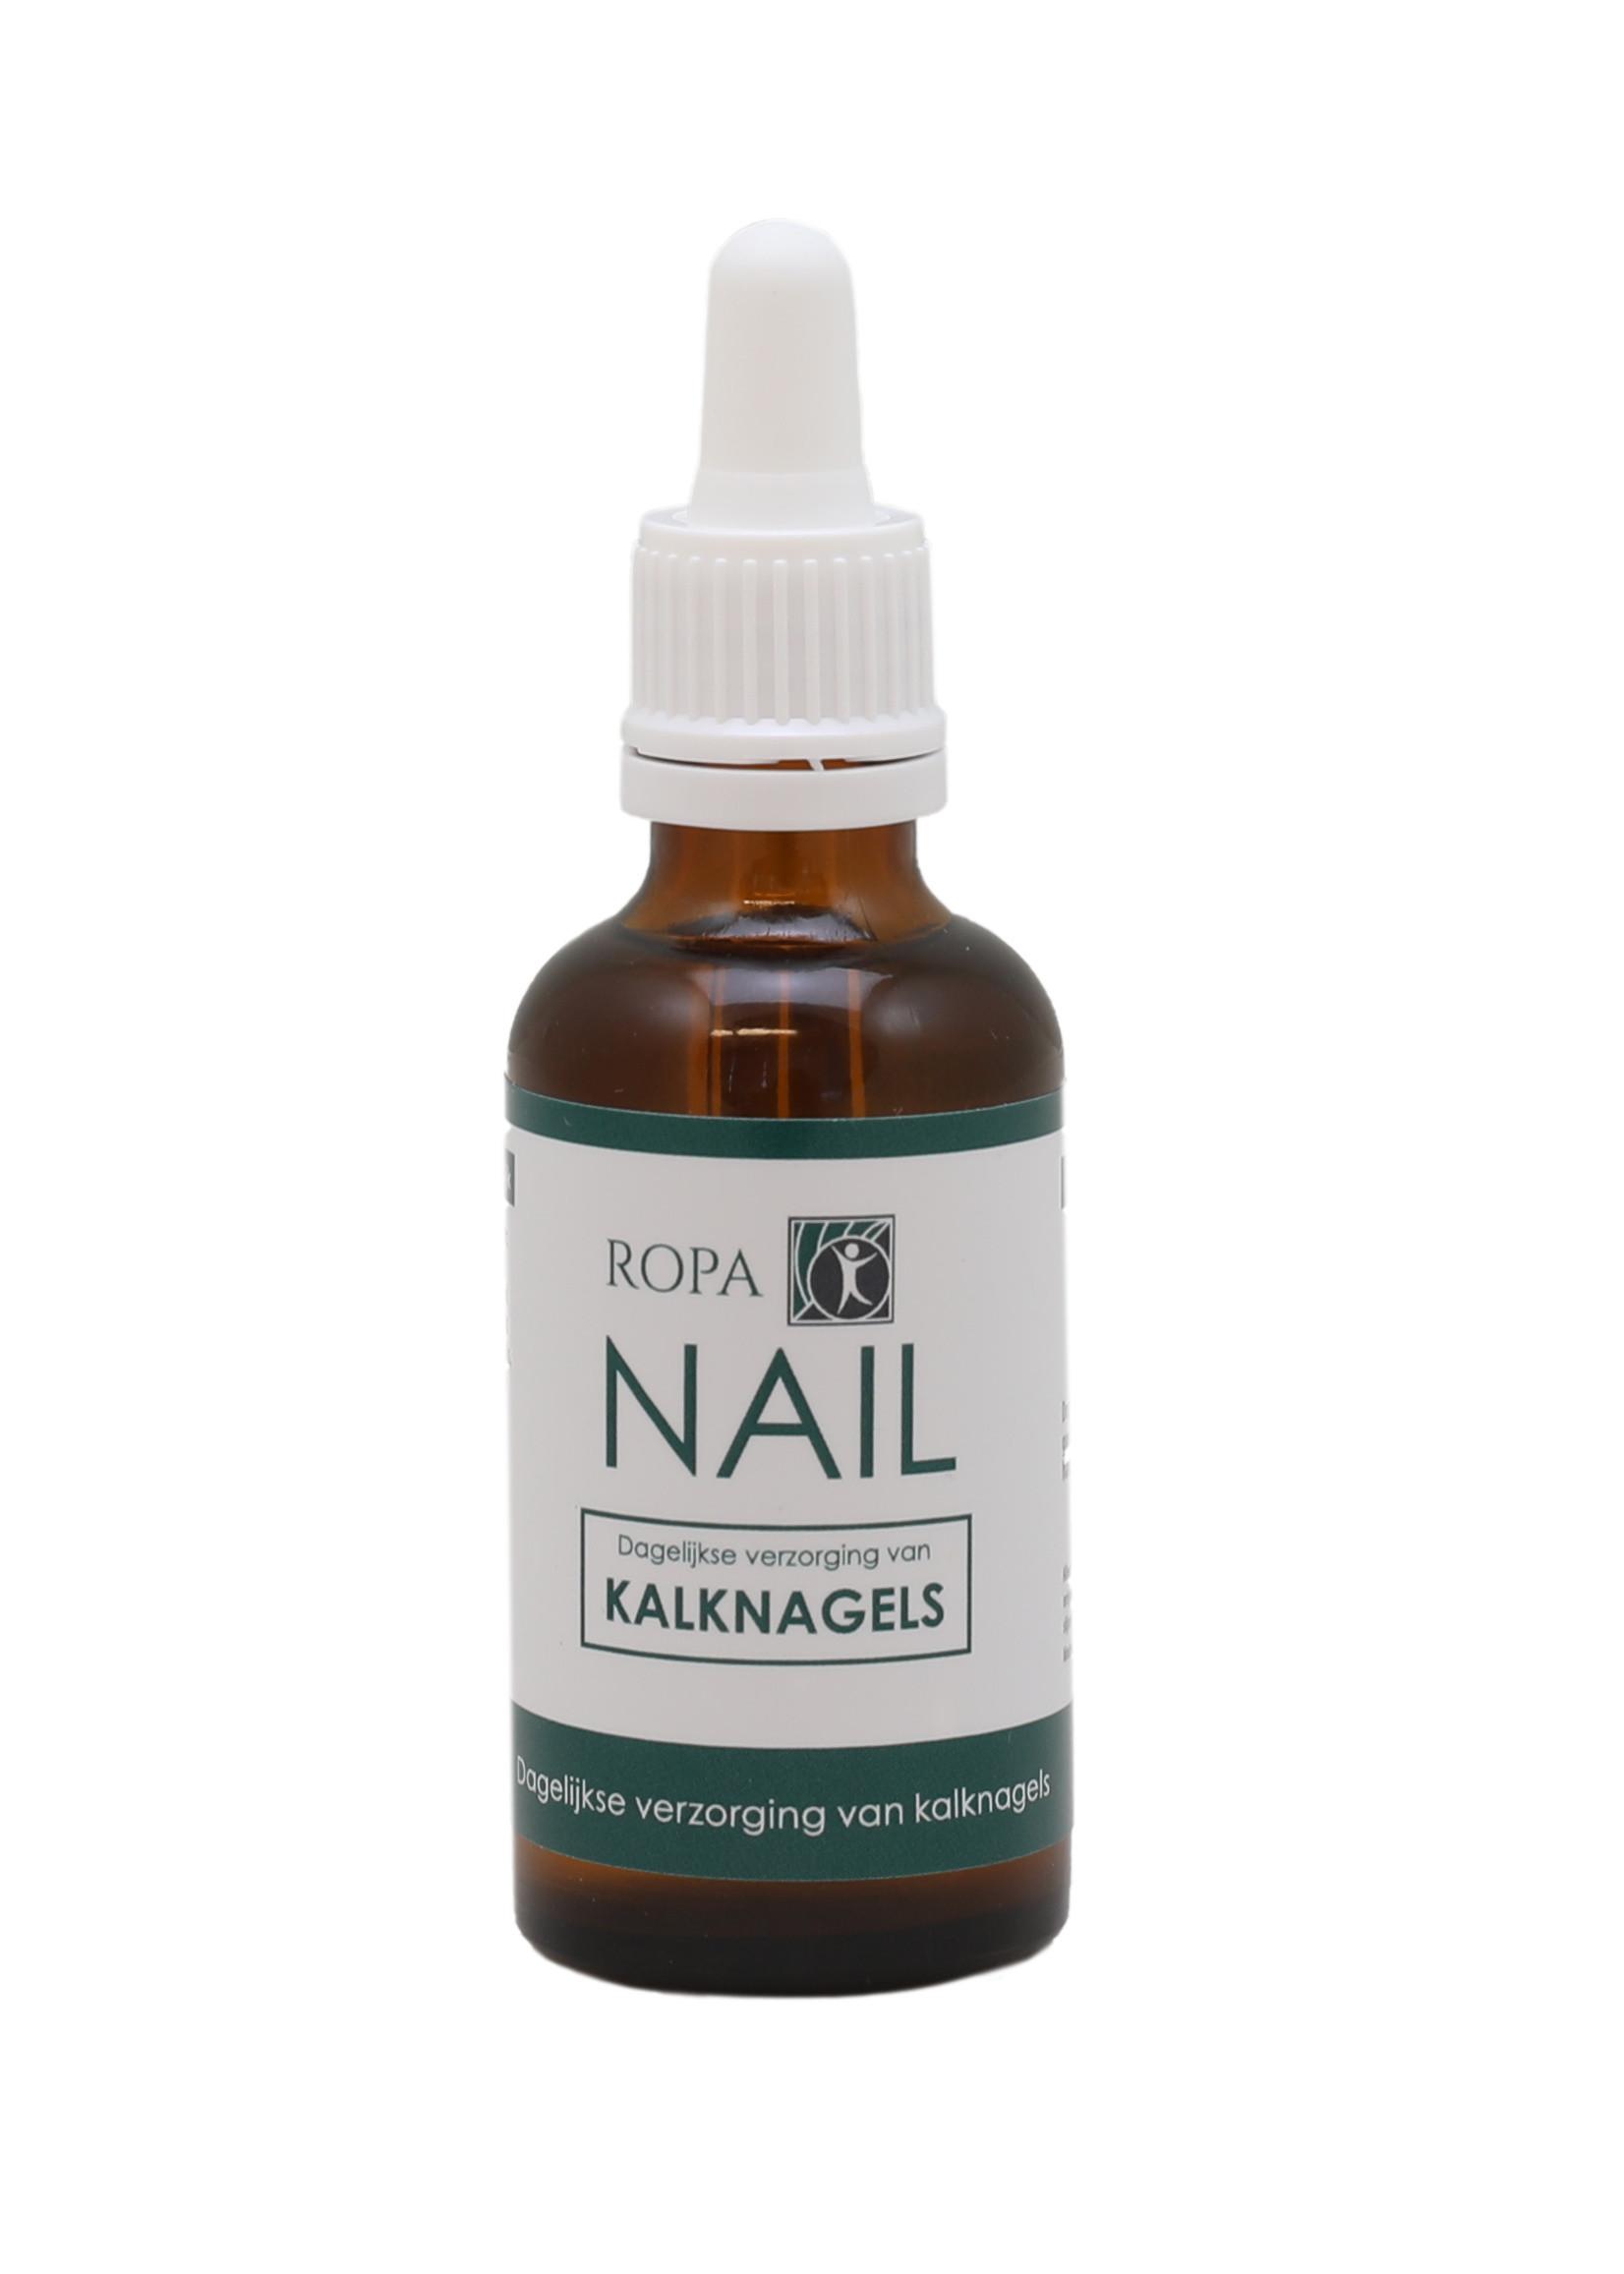 RopaNAIL kalknagel olie salonverpakking  (zakelijk) - 50 ml